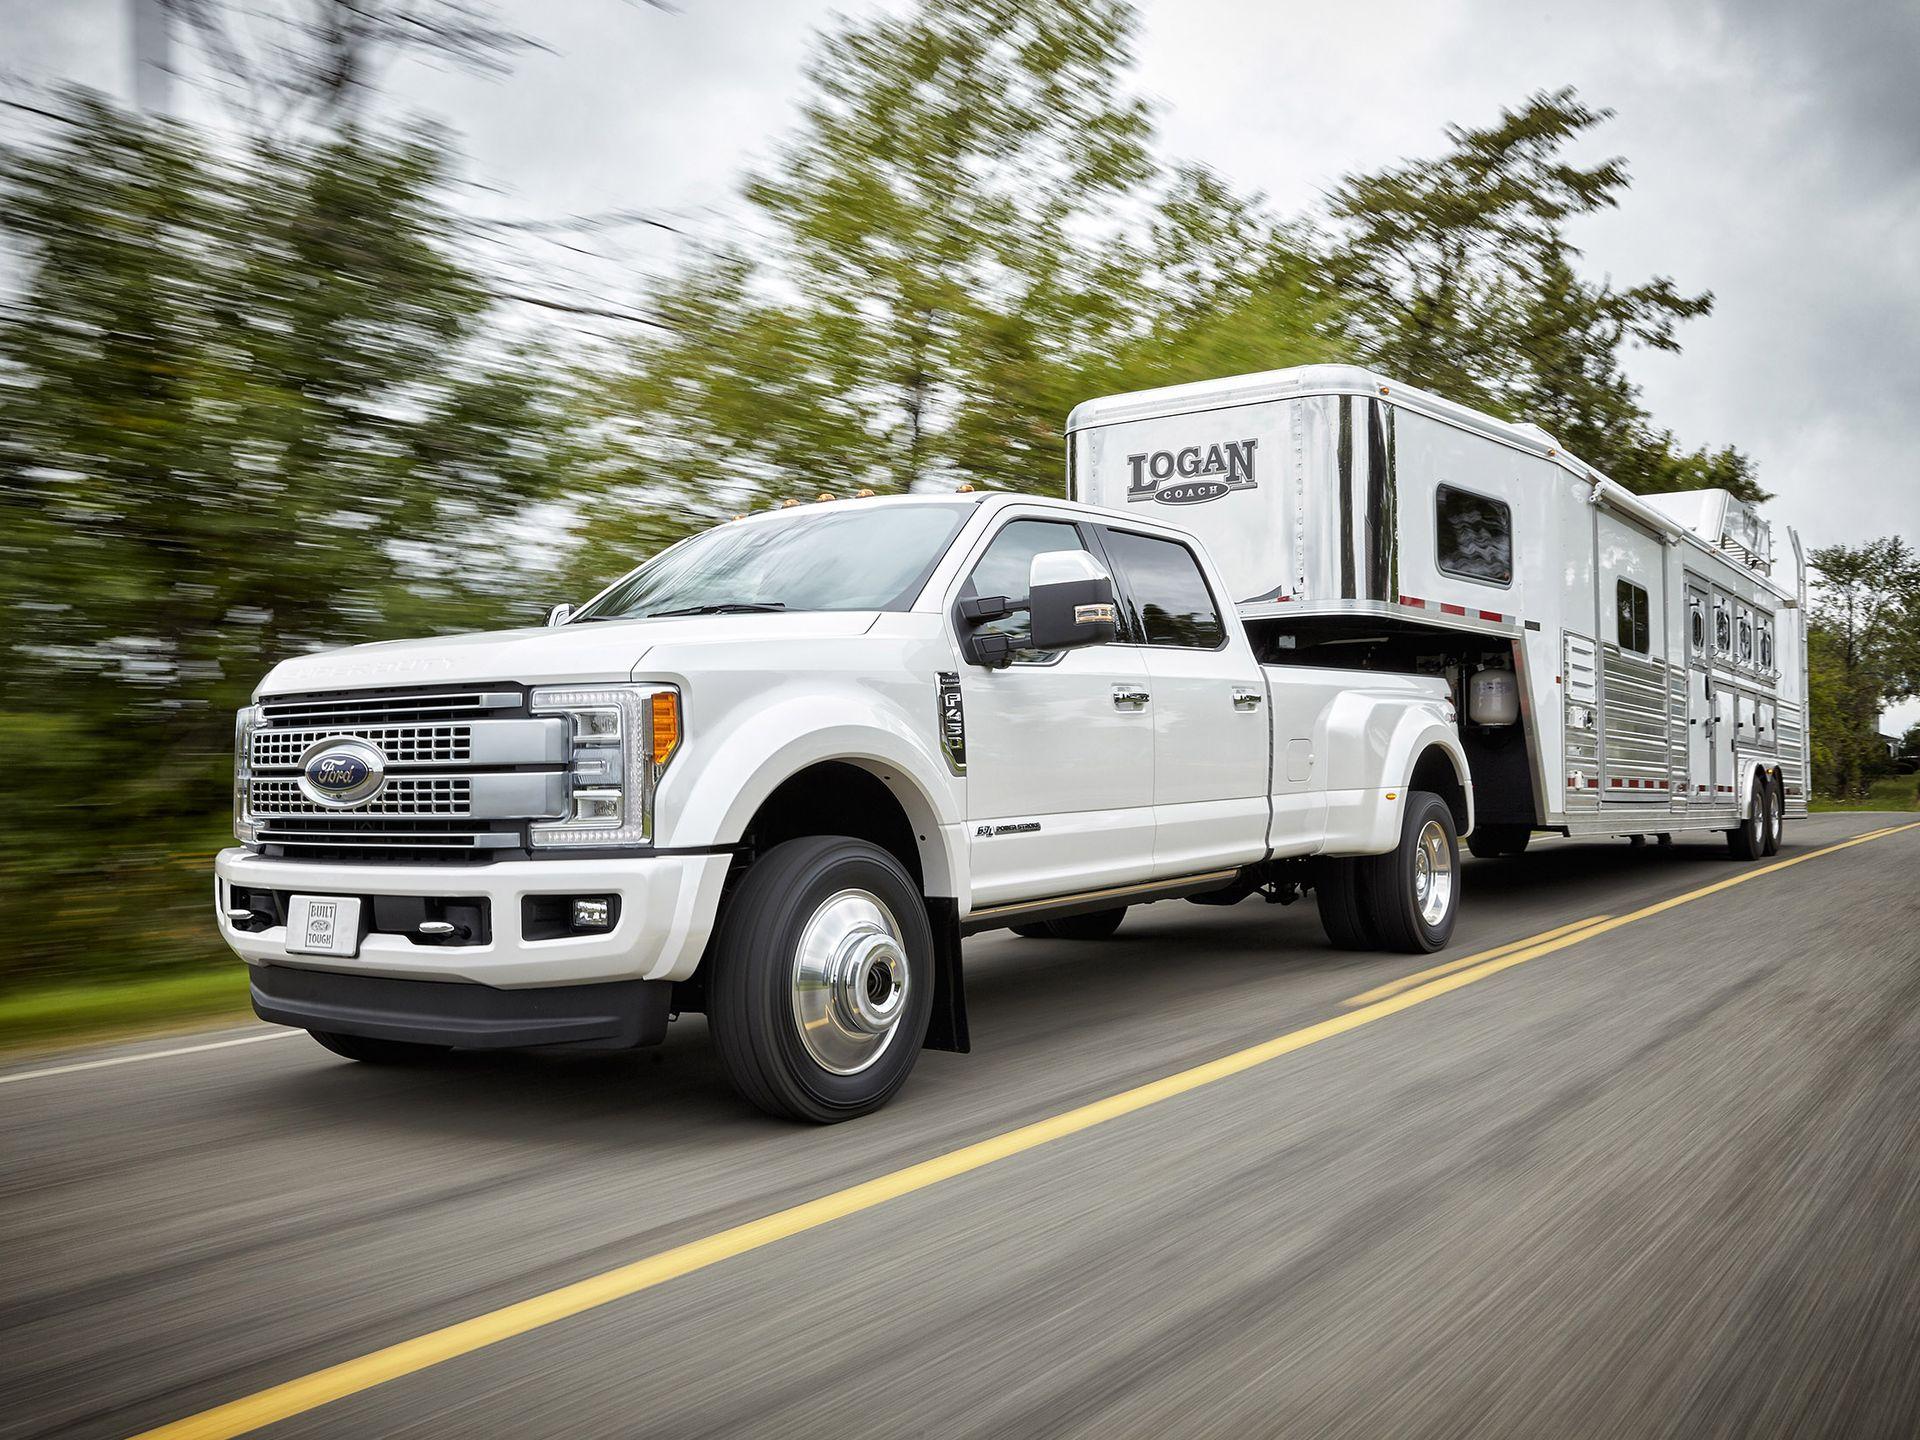 Ford's 2017 F-Series Super Duty truck.